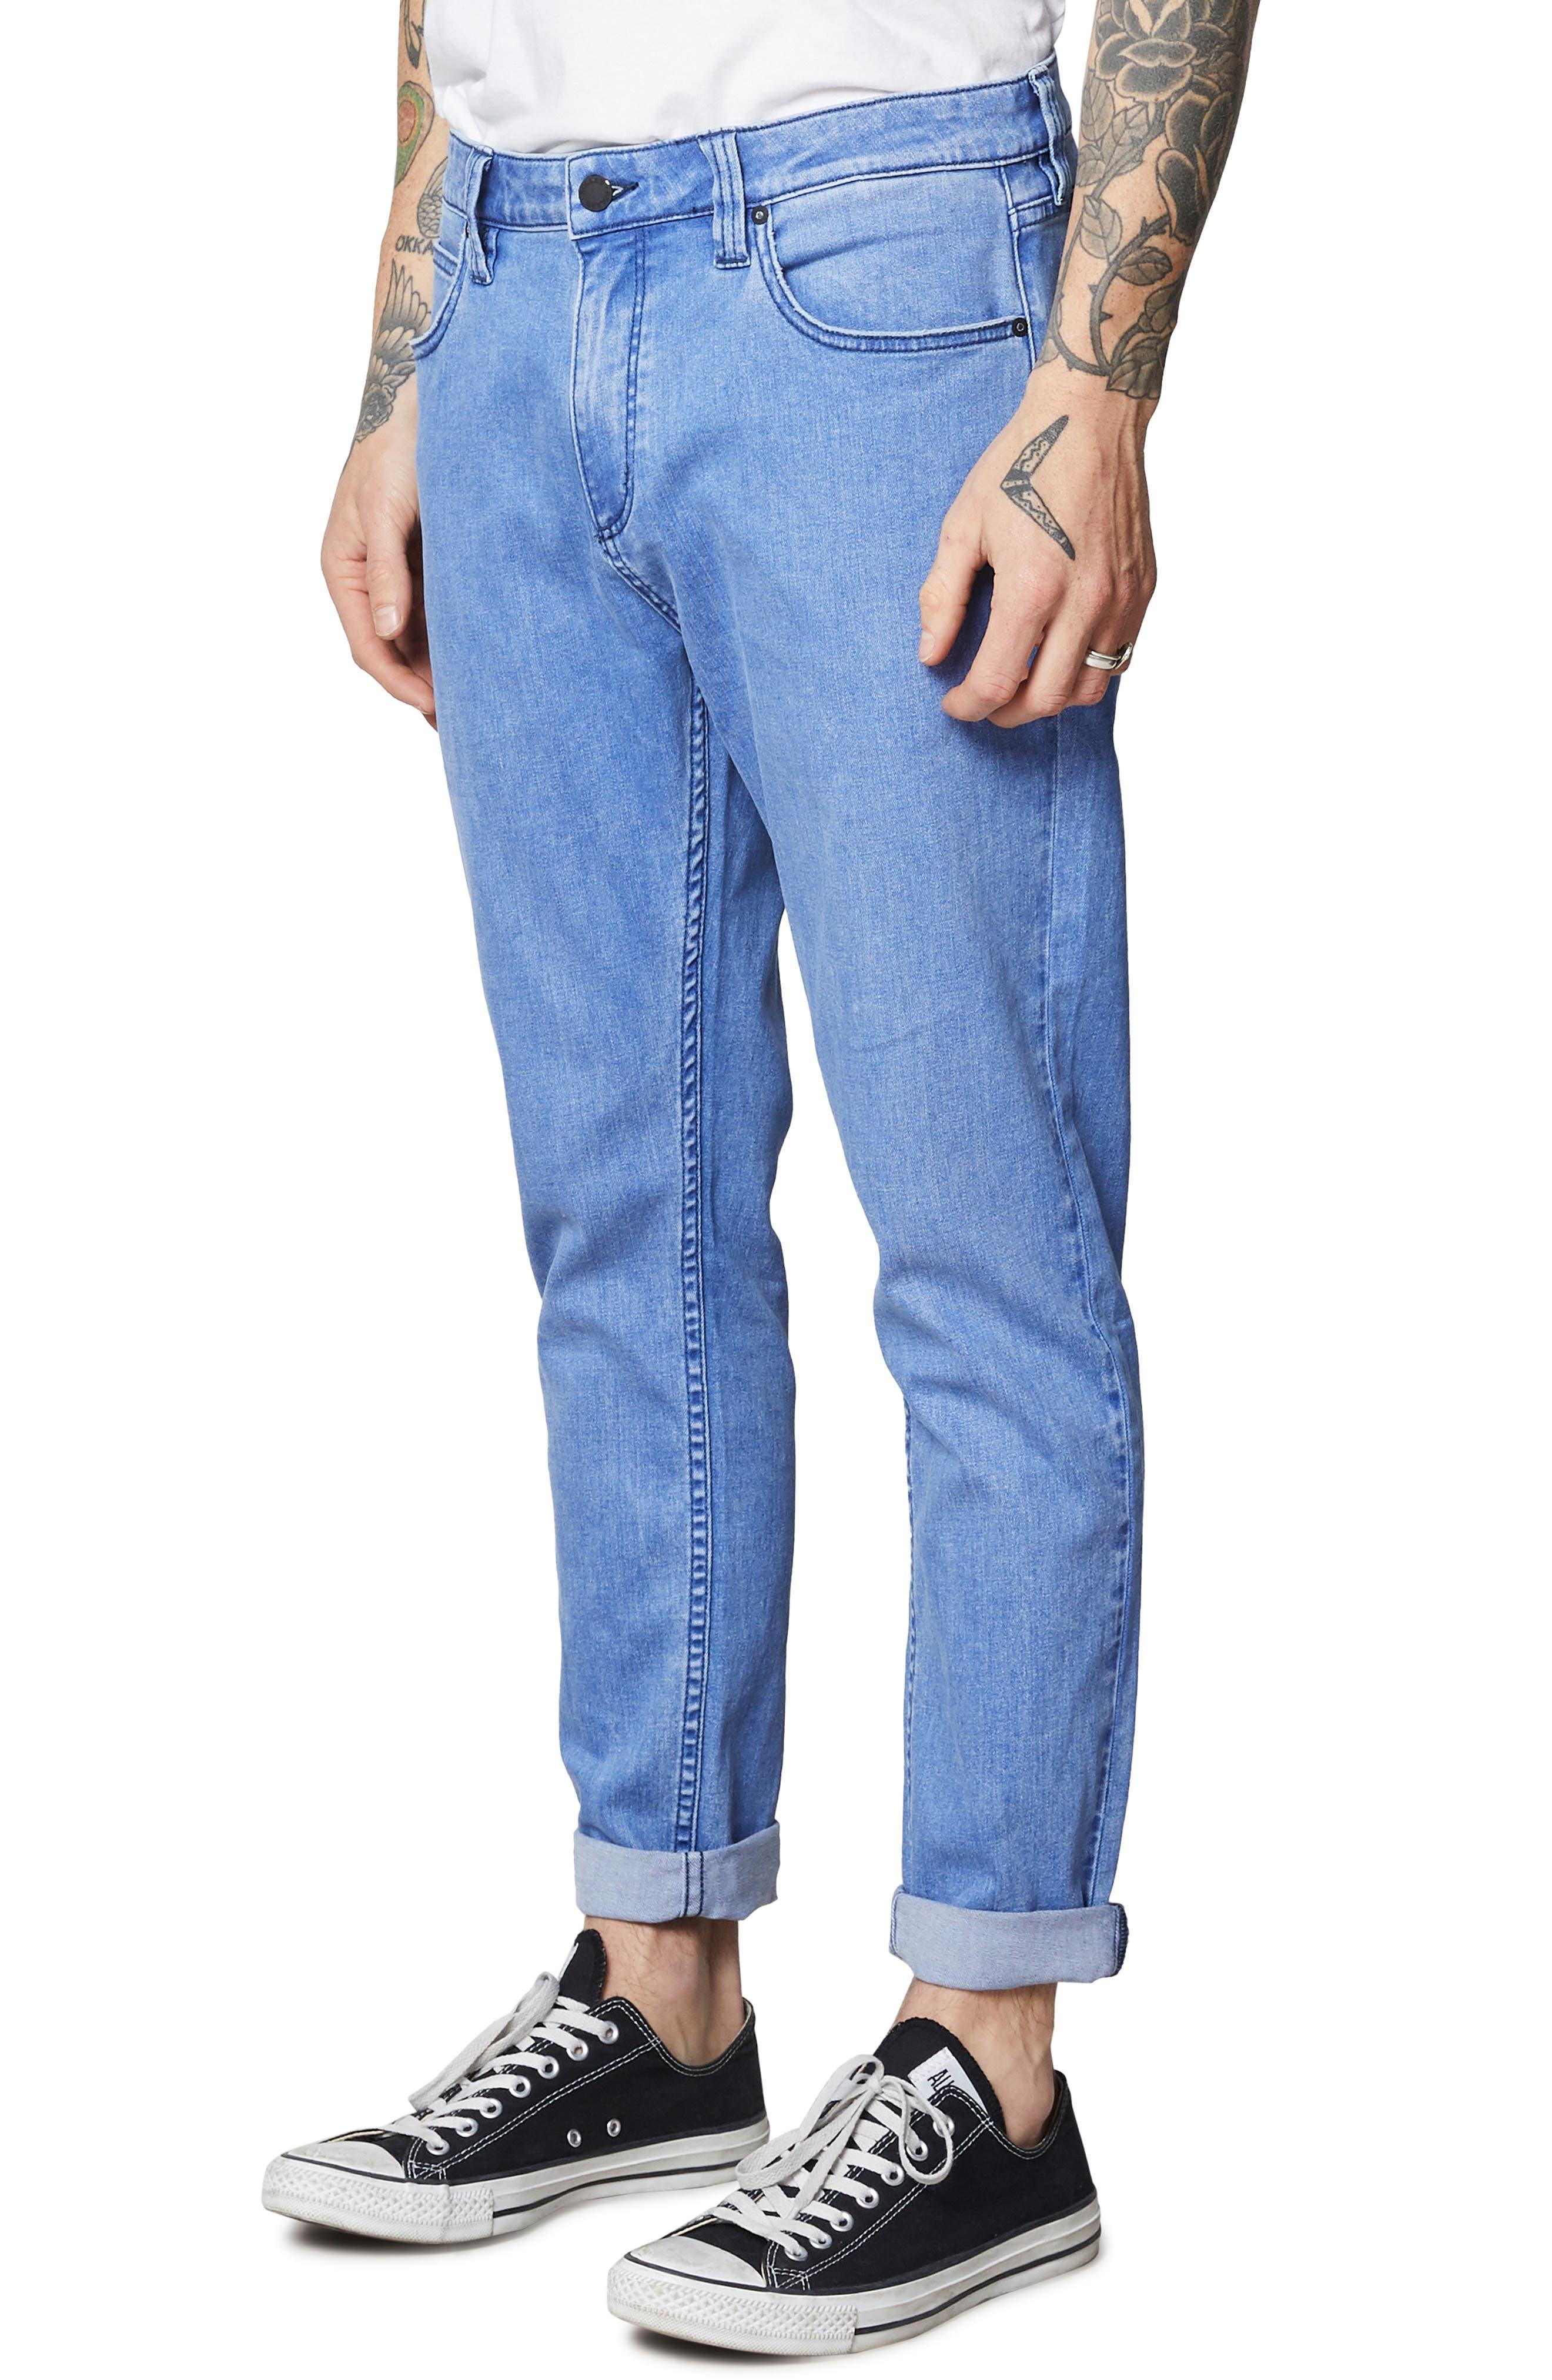 Rollies Slim Fit Jeans,                             Alternate thumbnail 3, color,                             BOLD BLUE